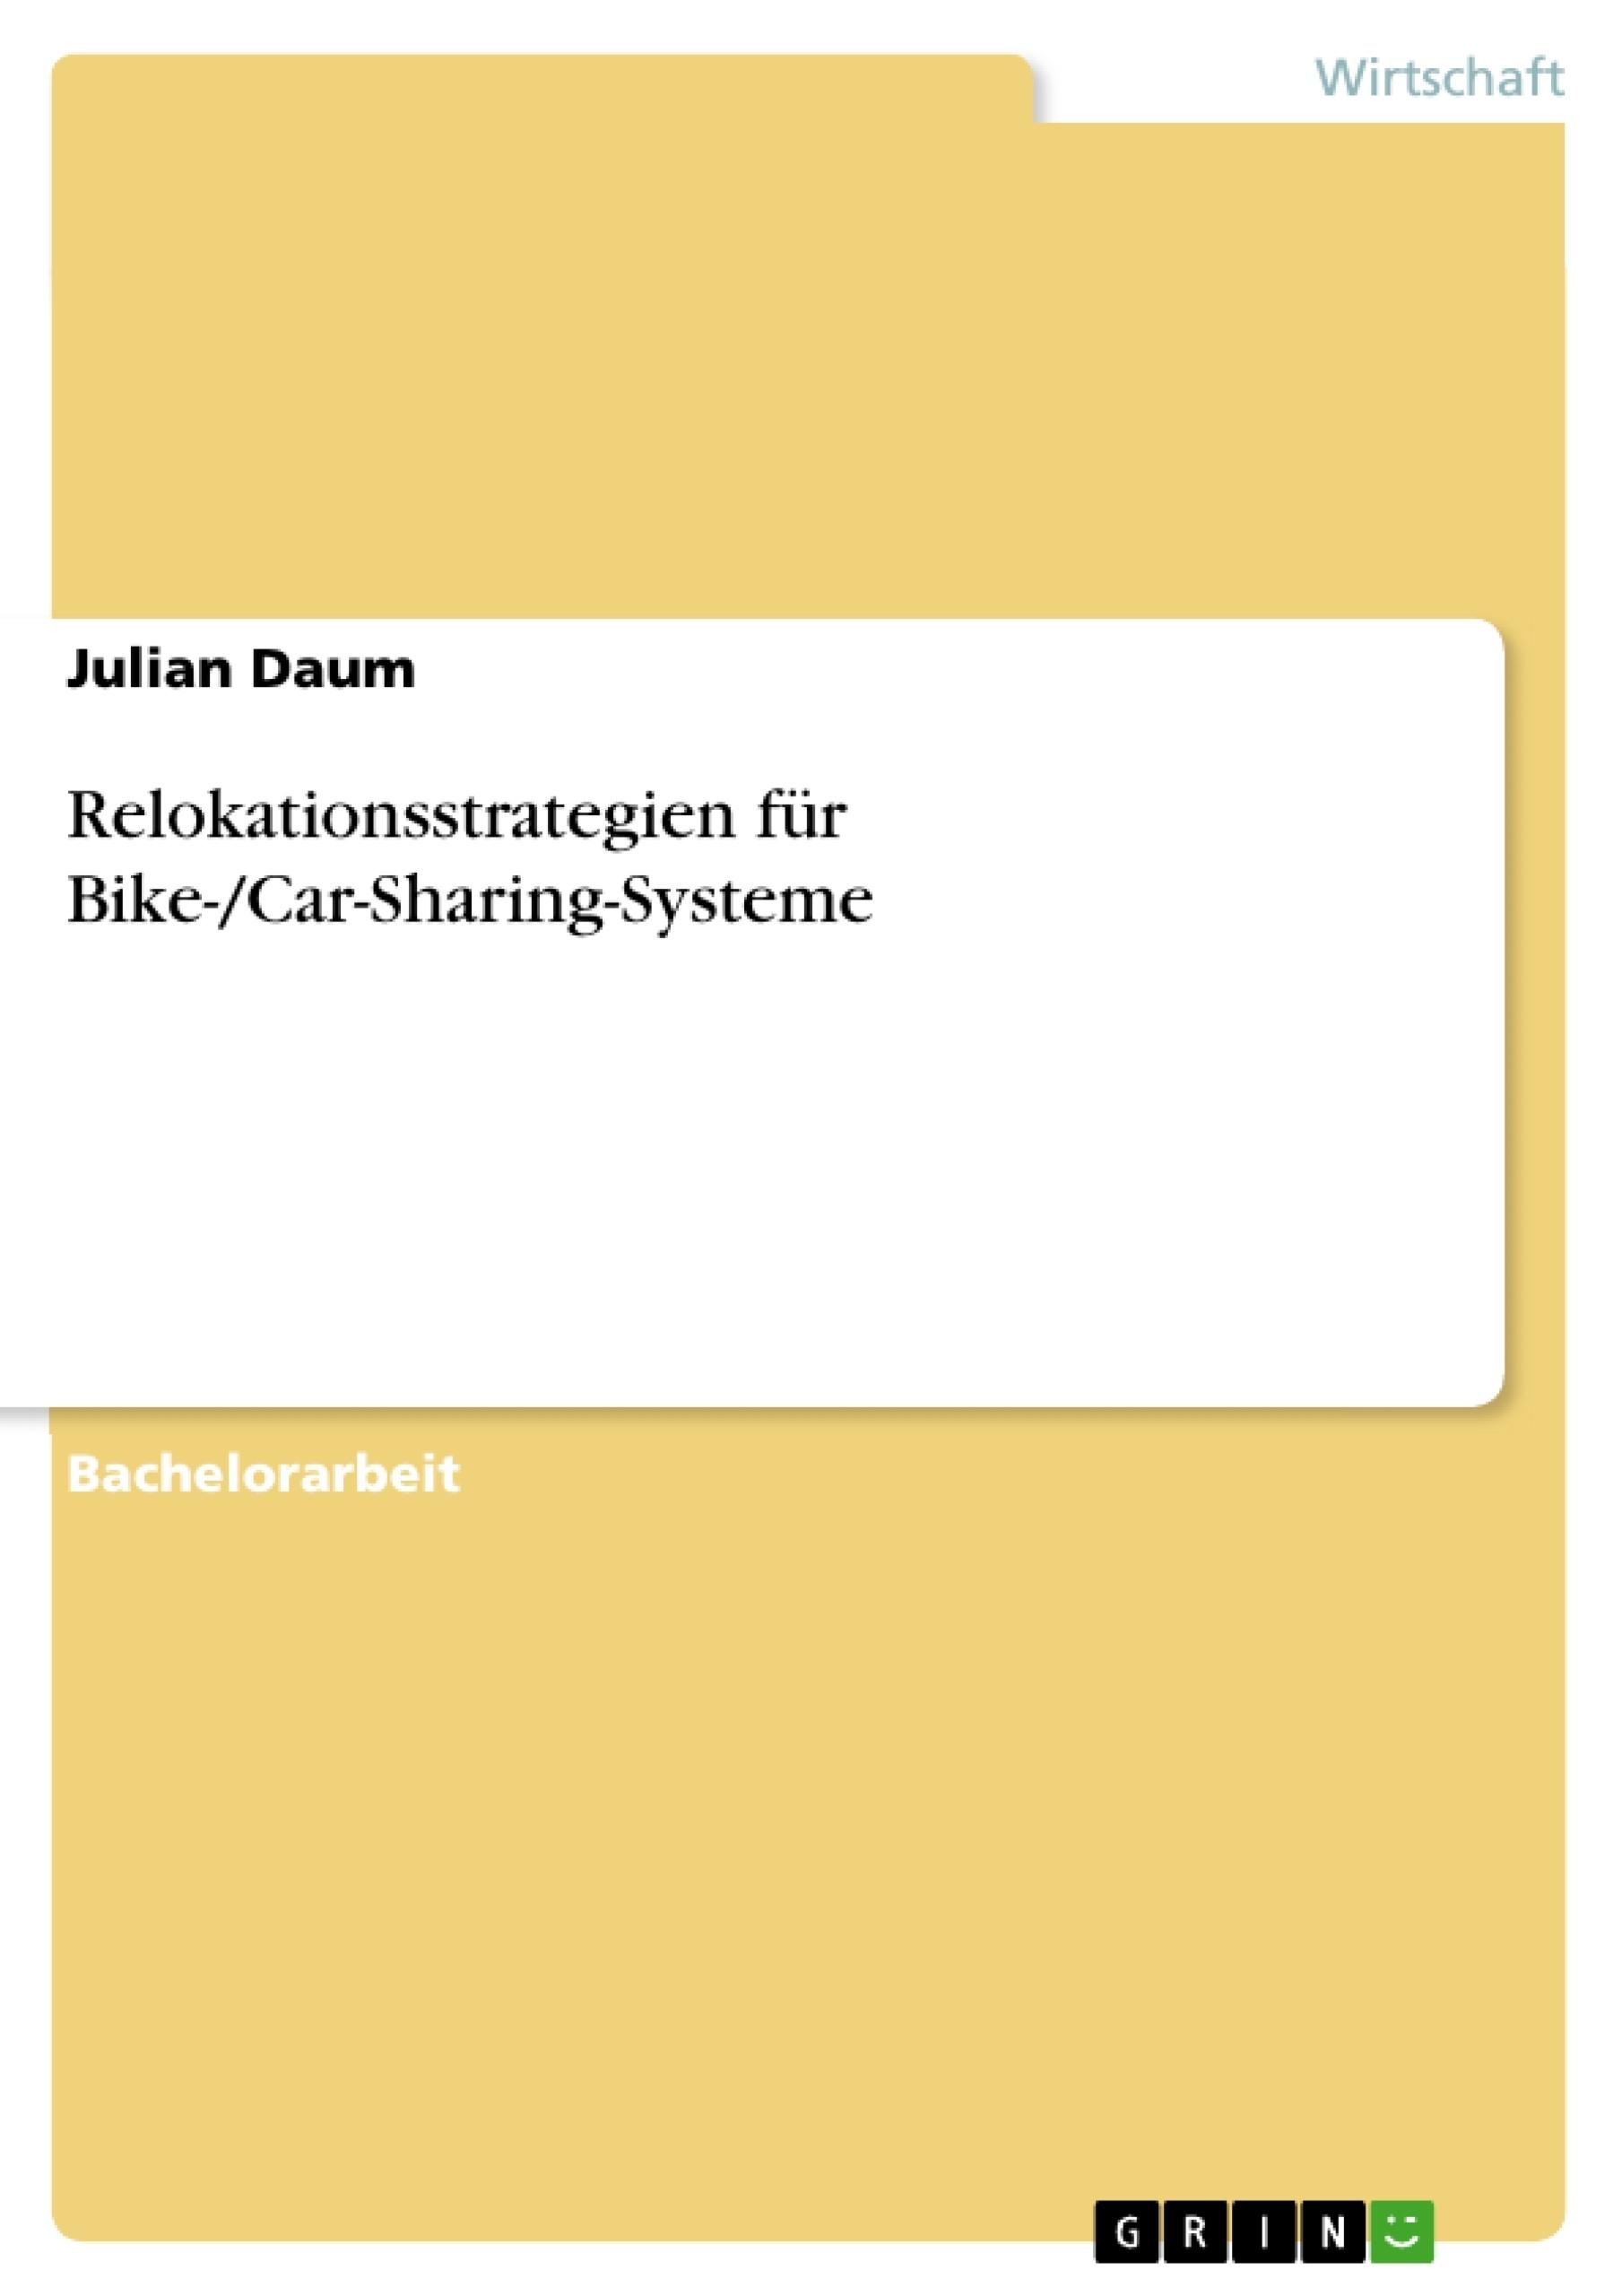 Titel: Relokationsstrategien für Bike-/Car-Sharing-Systeme